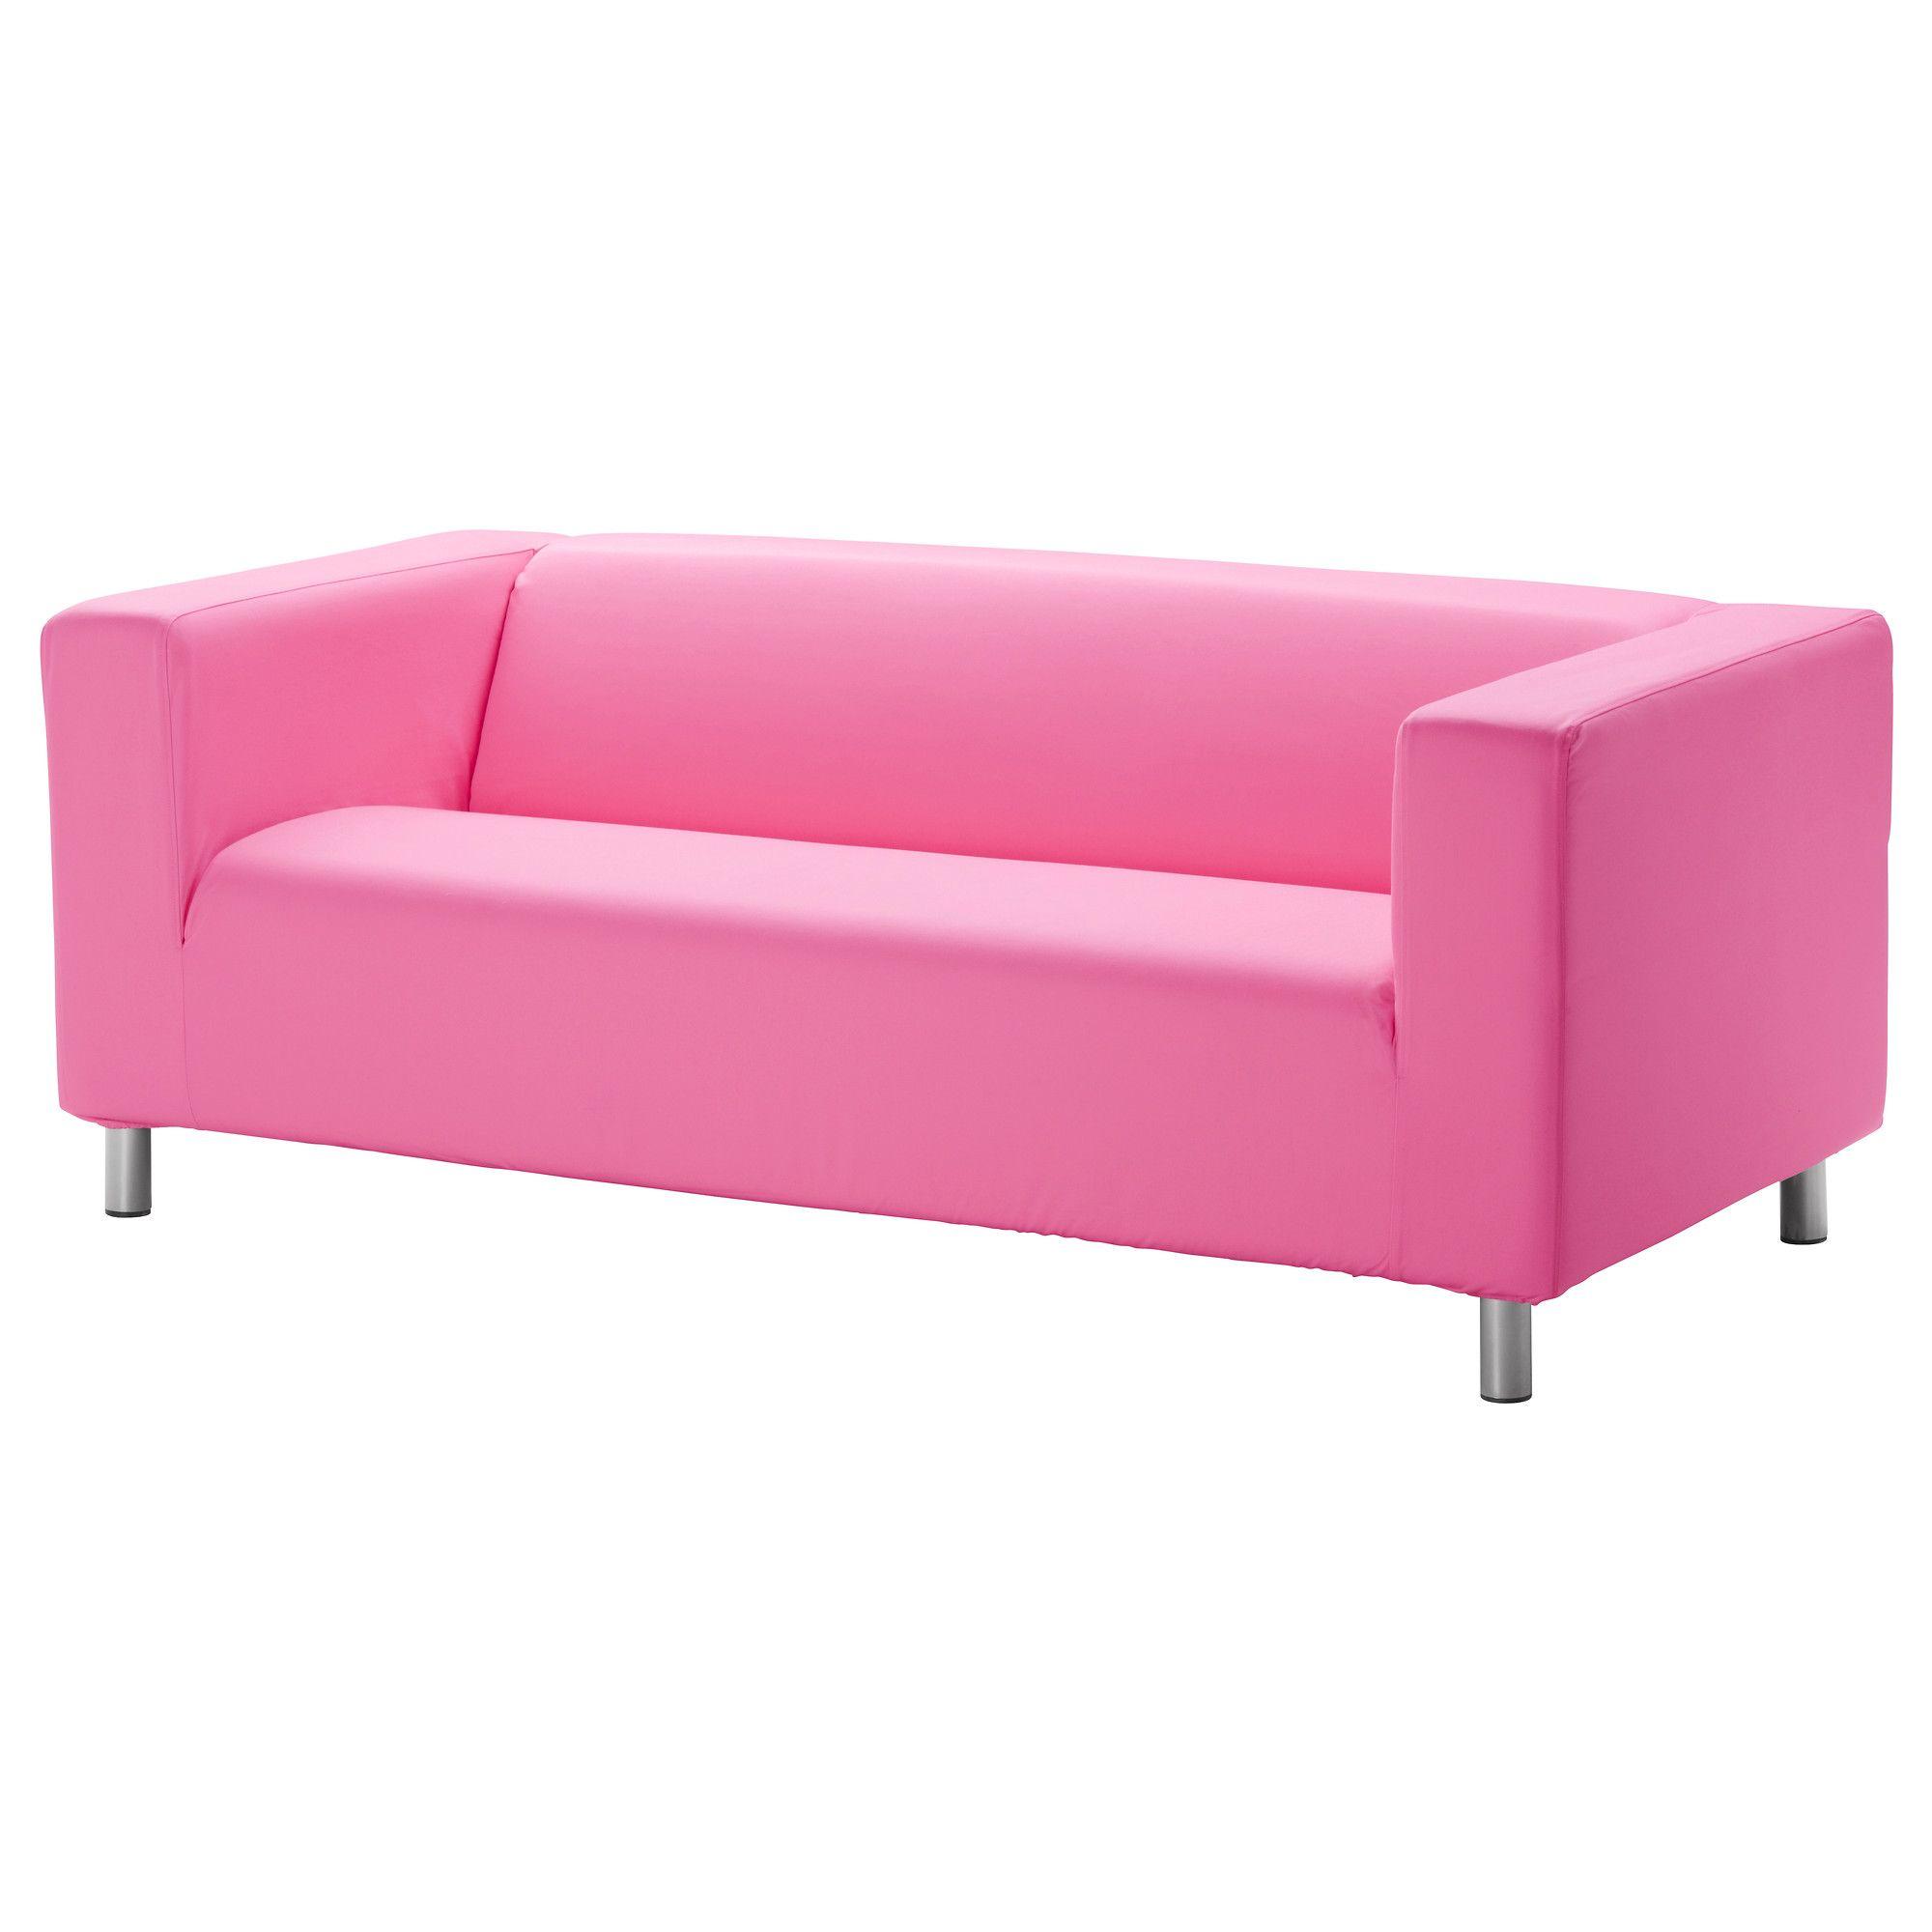 Klippan Two Seat Sofa Granån Pink Ikea